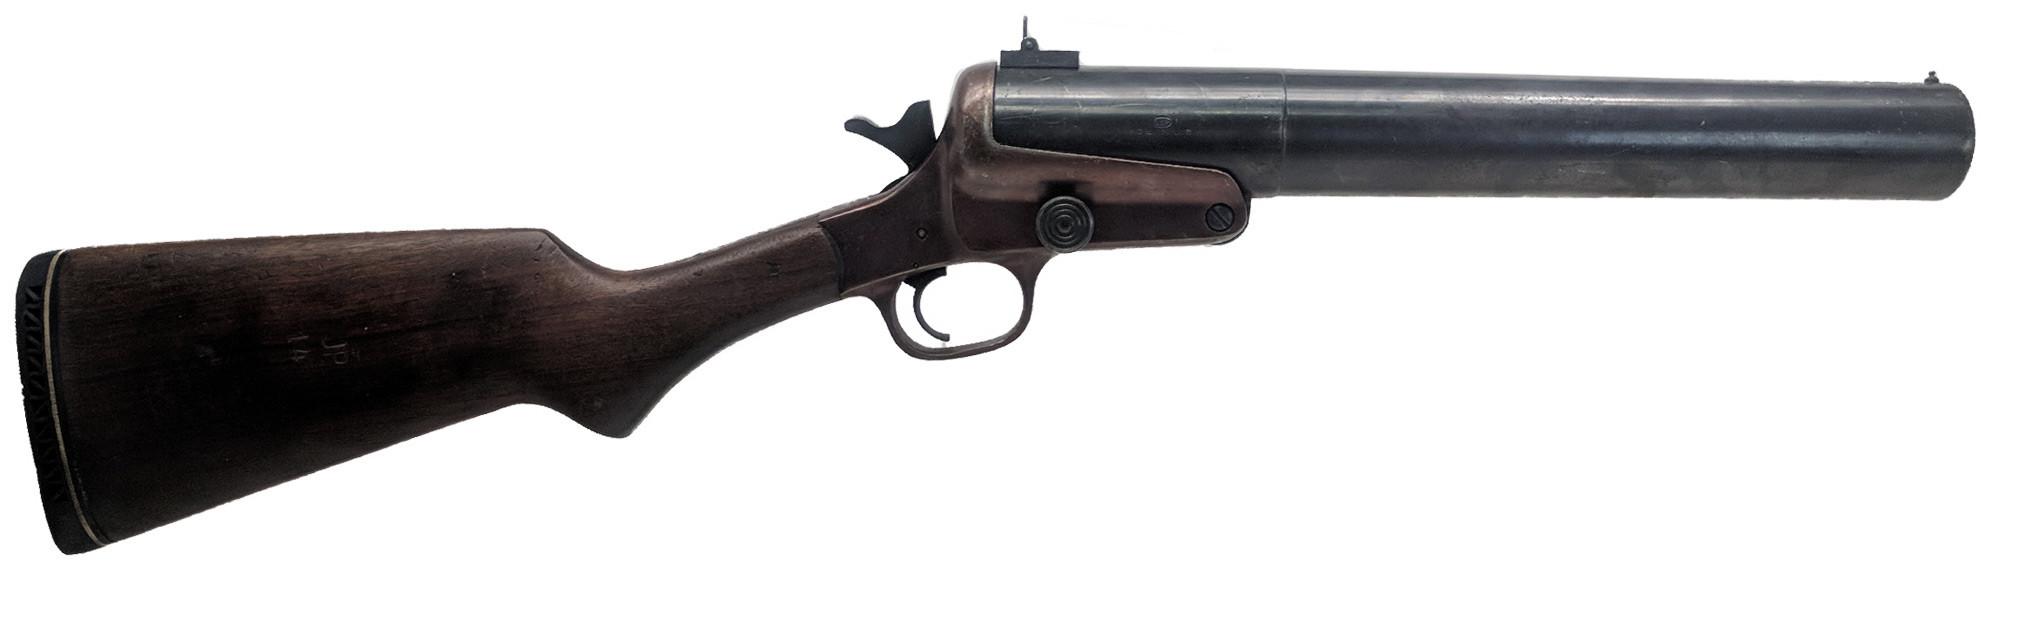 Tru-Flite Super Long Range Gas Gun, 37mm